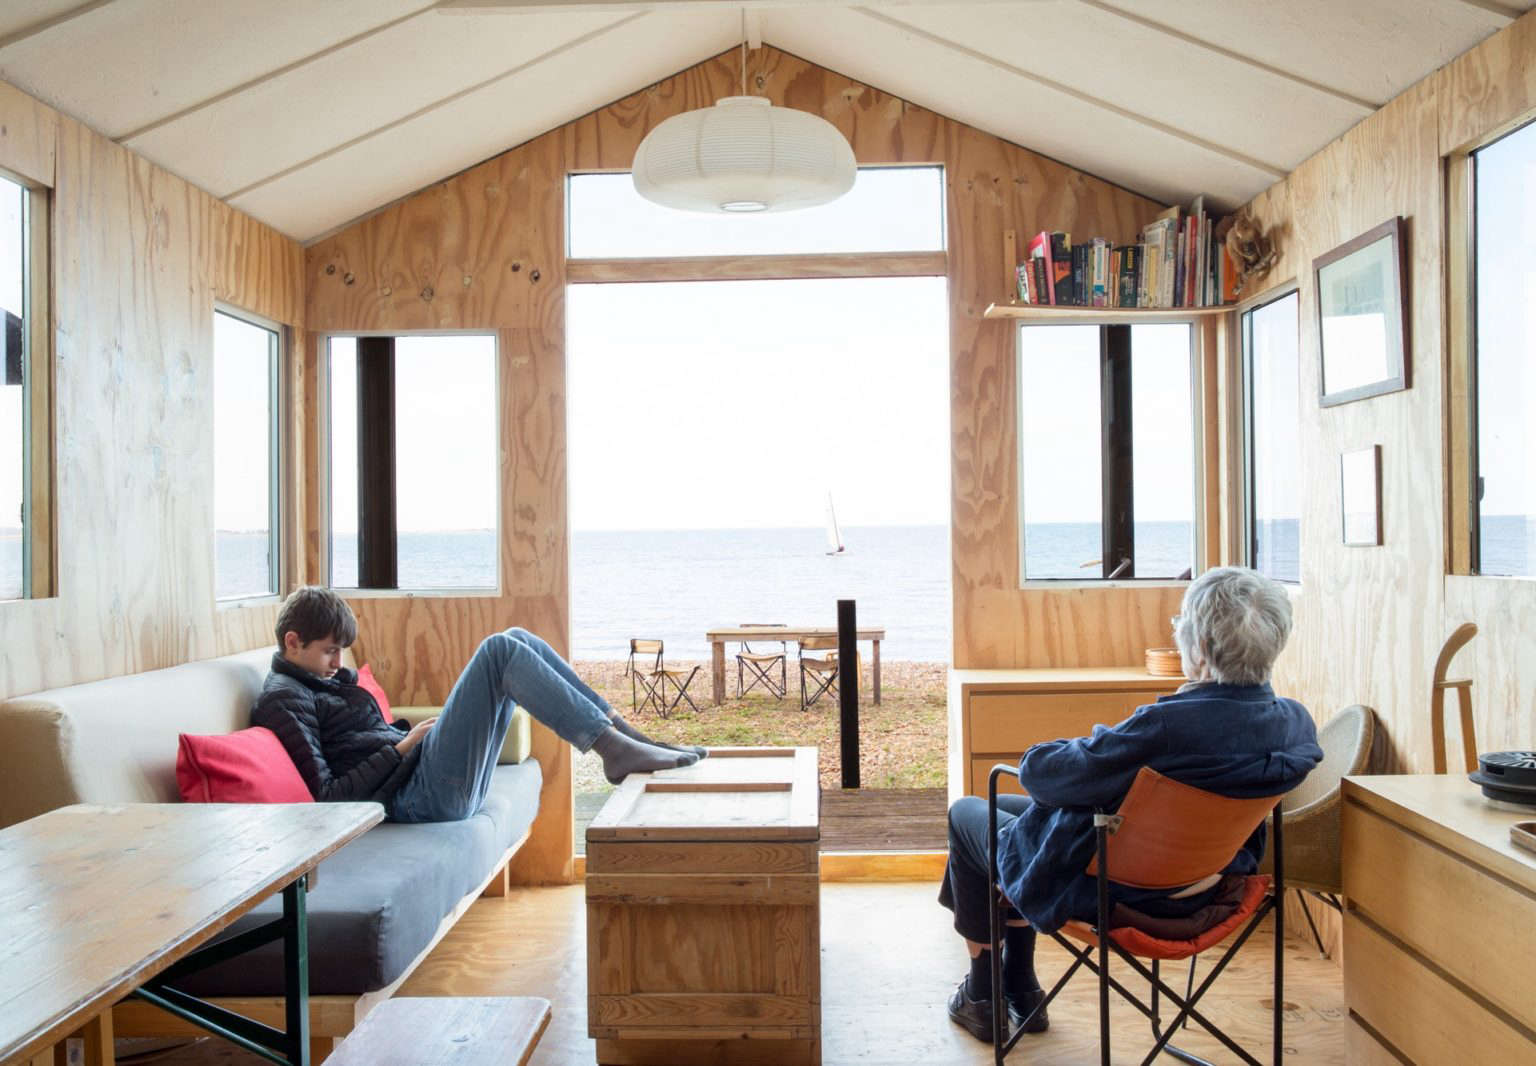 marcia mihotich tiny plywood beach house seasalter kent england 3 1536x1066